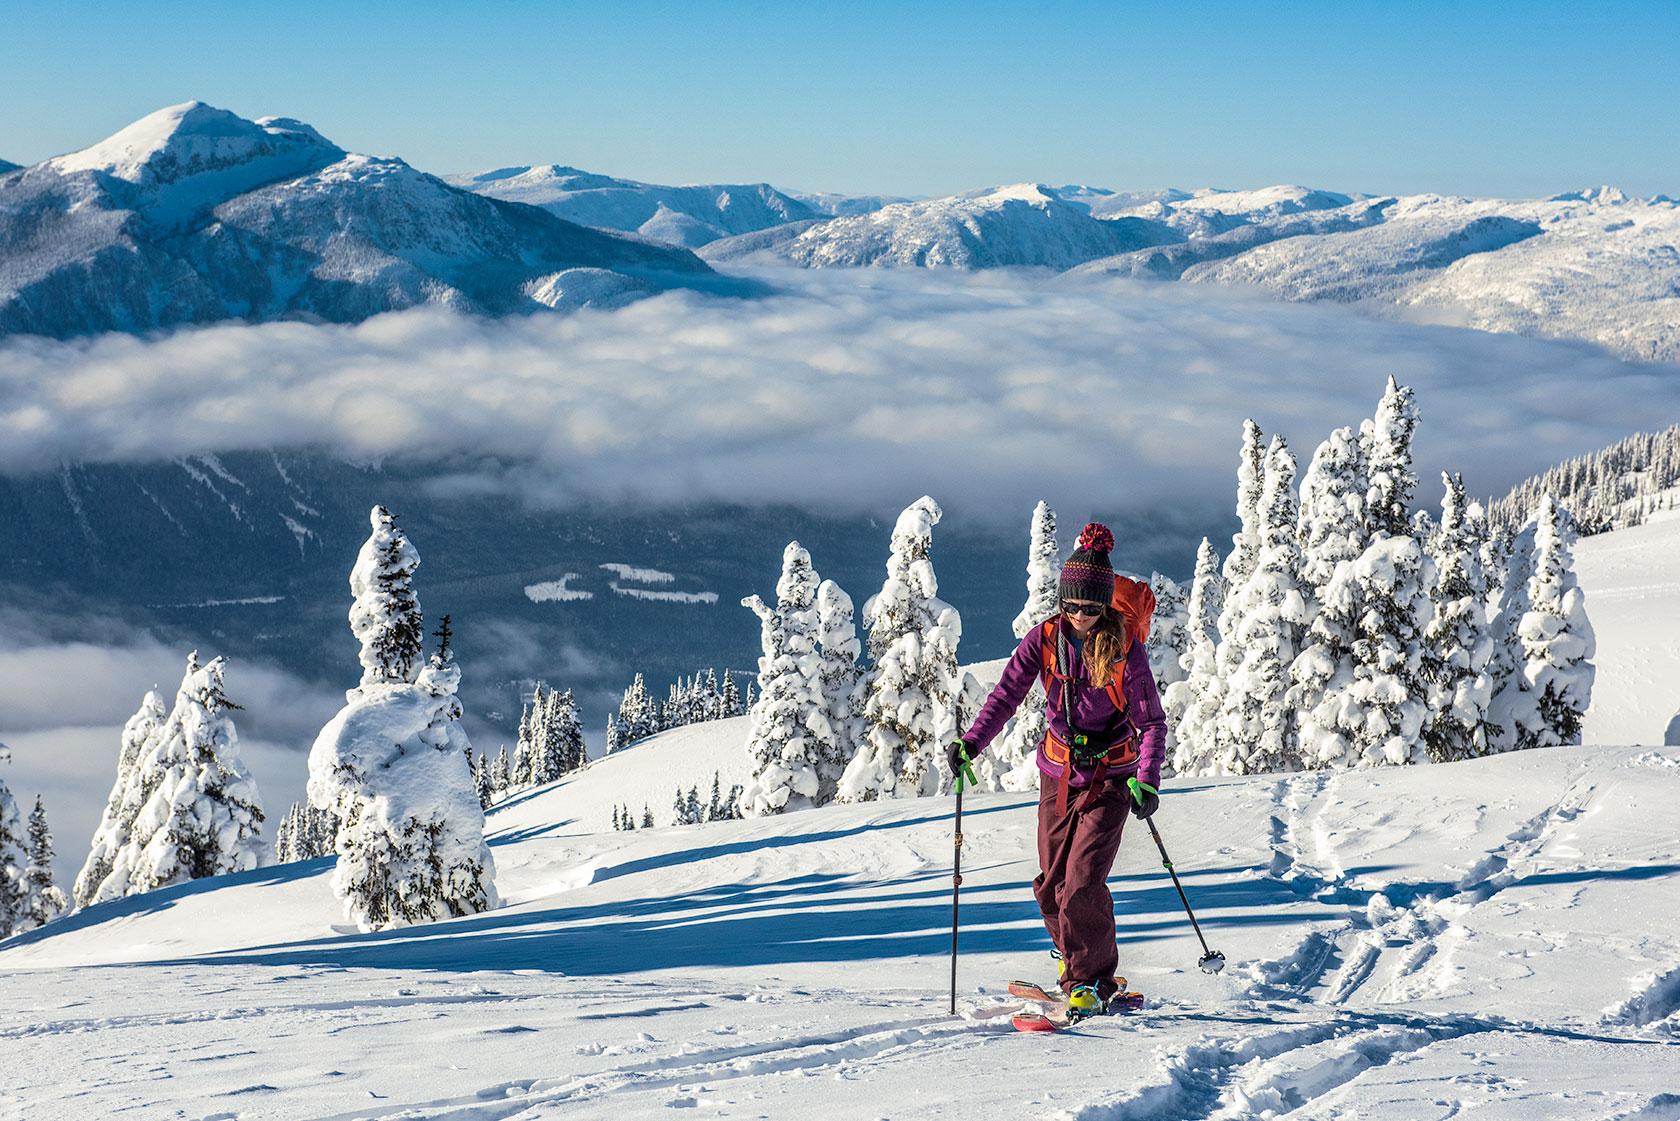 austin-trigg-patagonia-banff-alberta-winter-revelstoke-bc-british-columbia-mountains-valley-snow-skiing-touring-backcountry-adventure-skin-track-inversion-layer.jpg